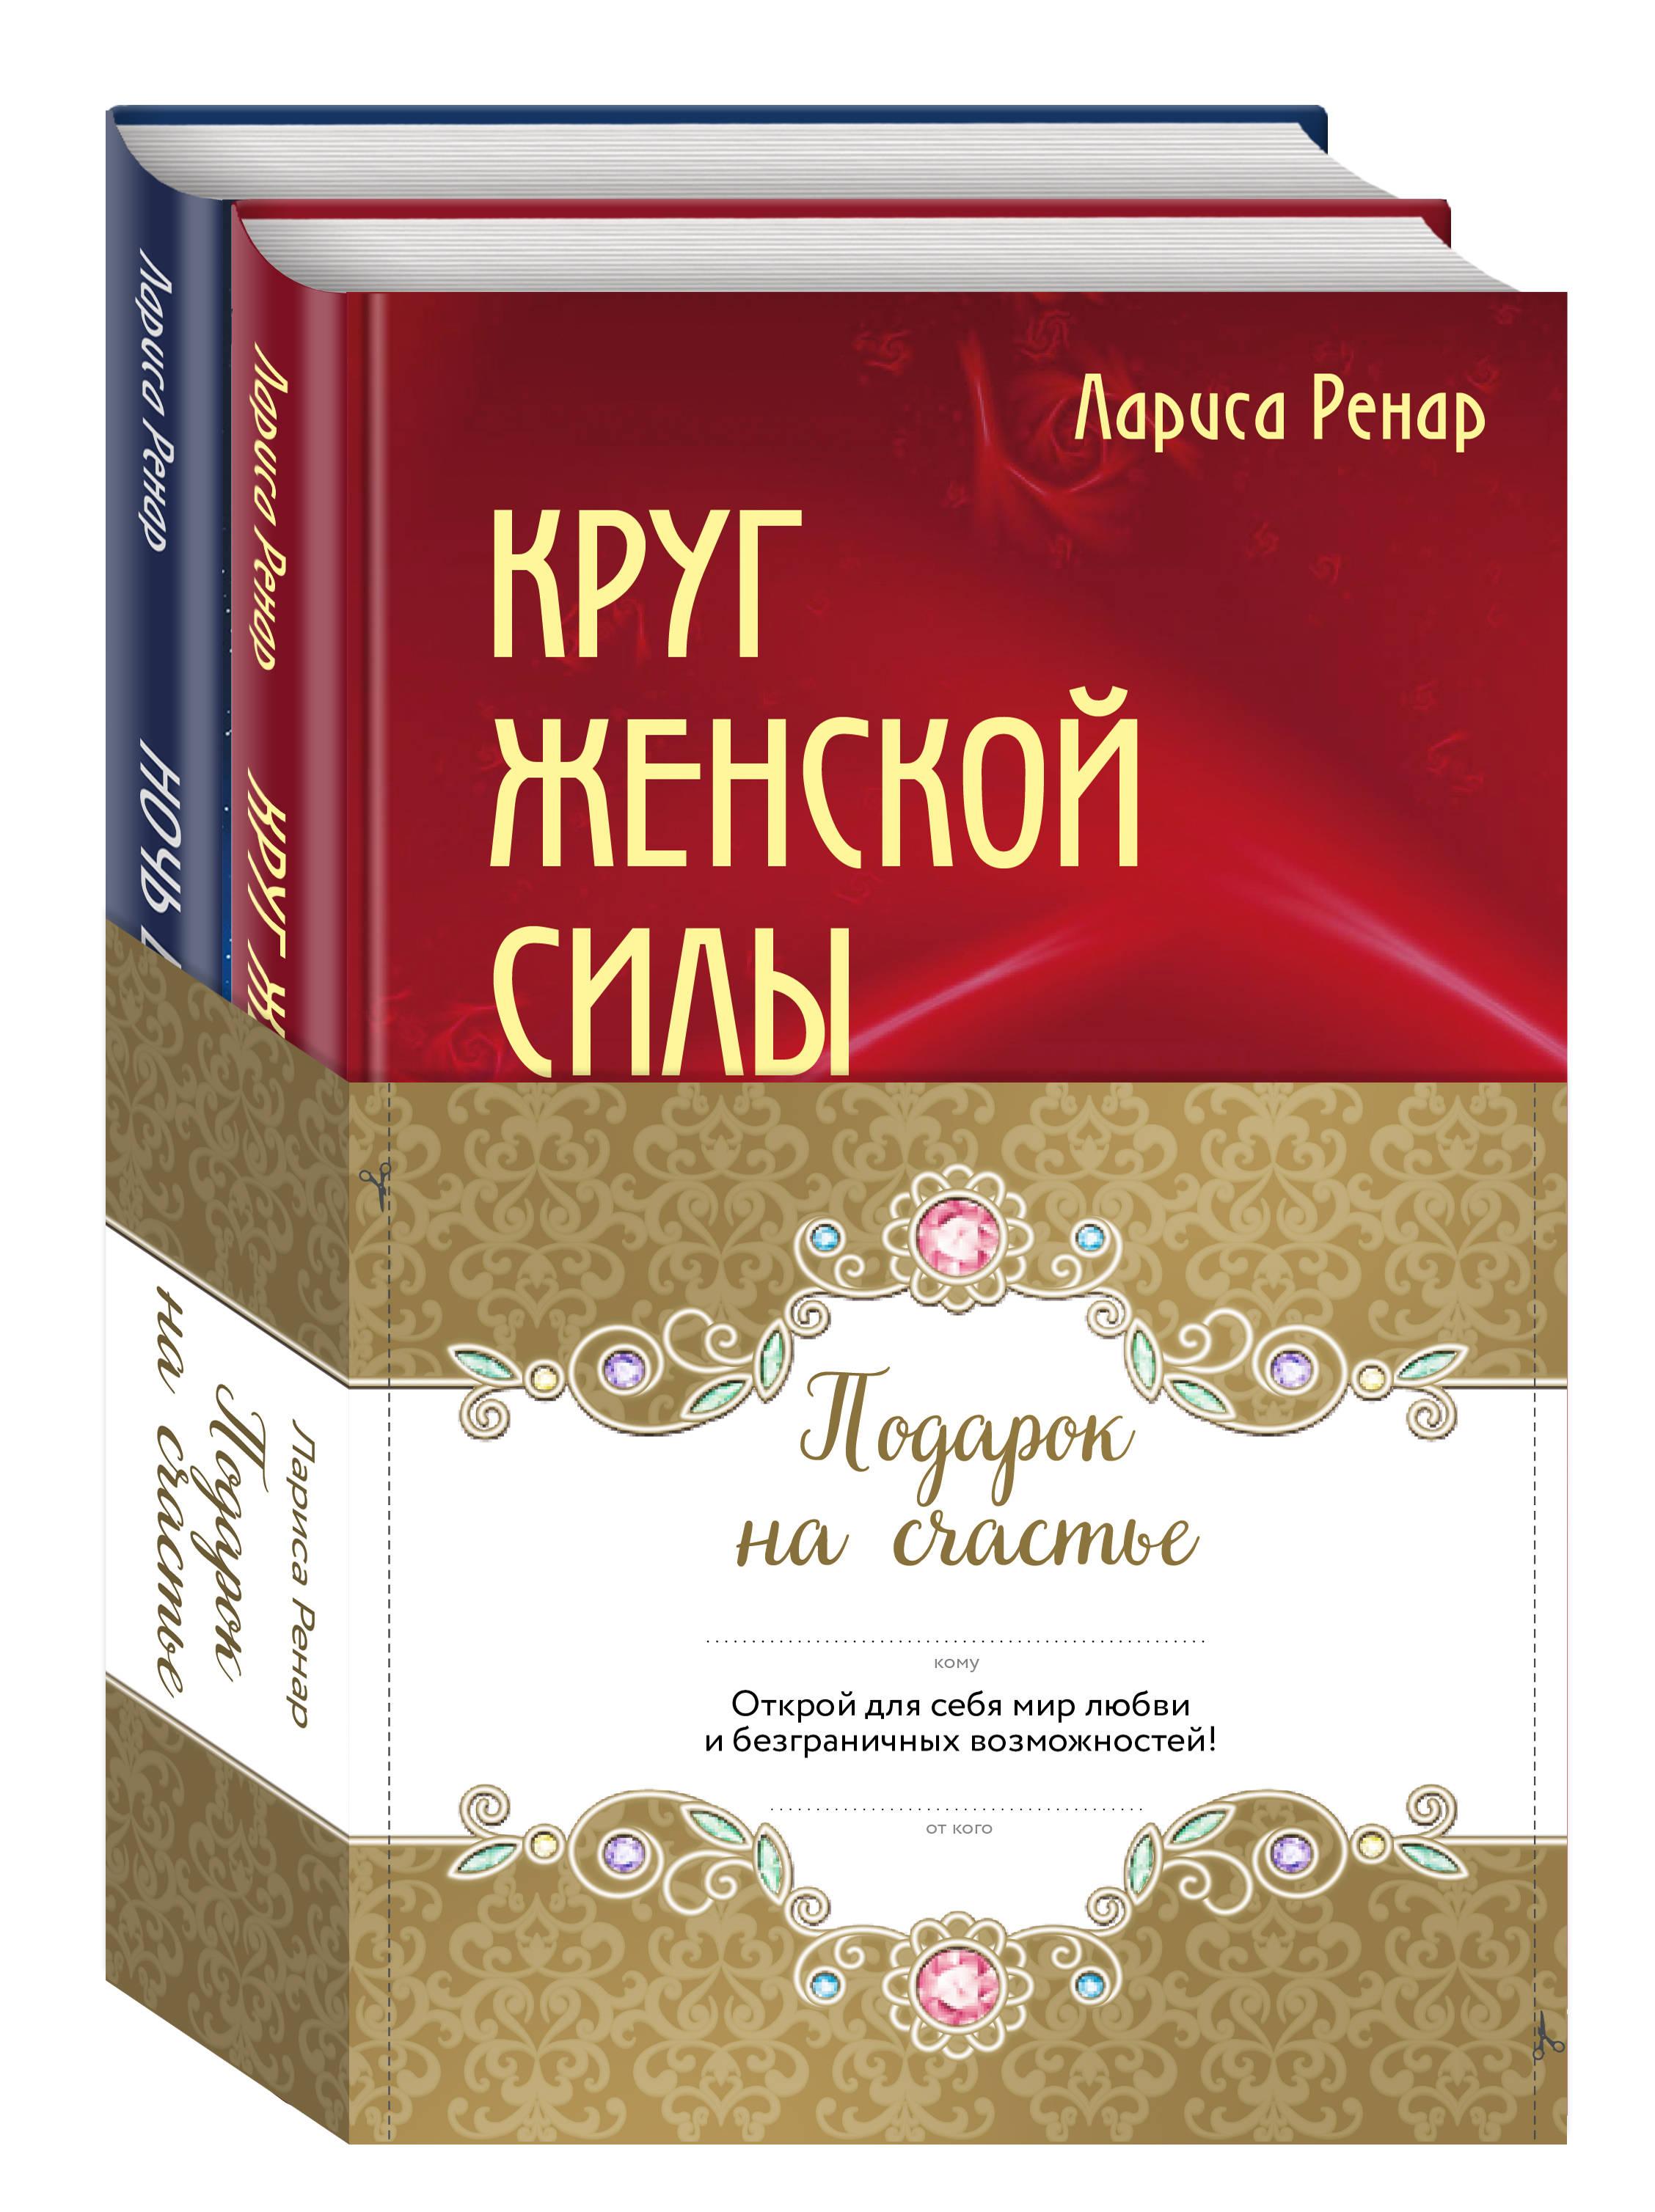 Ренар Лариса Подарок на счастье от Ларисы Ренар (комплект) цены онлайн